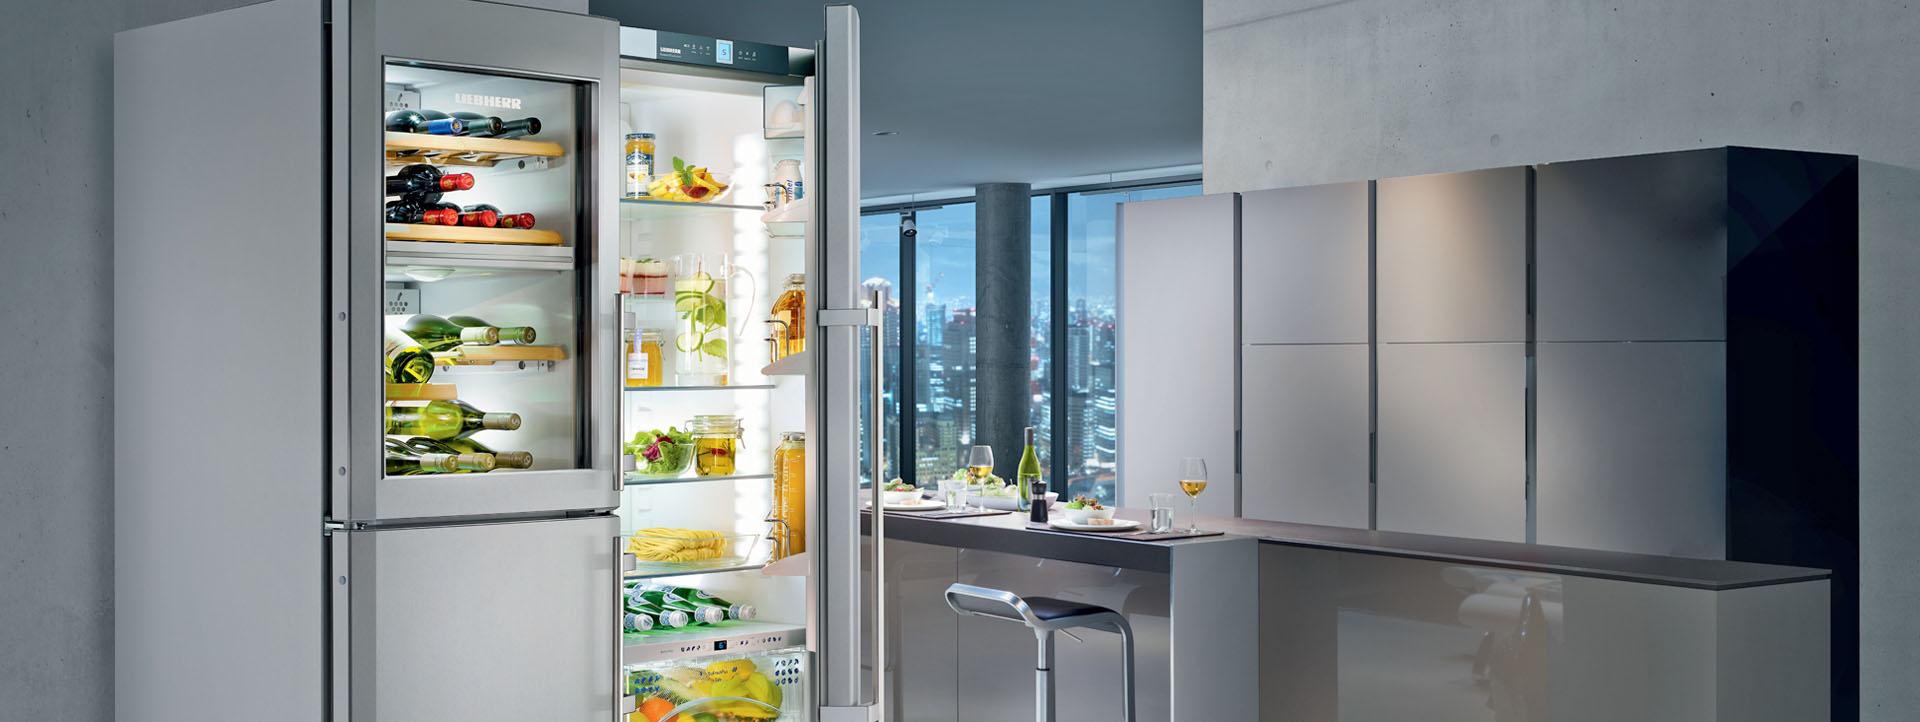 liebherr ricambi frigorifero  LIEBHERR frigoriferi congelatori cantine tecnoservicevr assistenza ...